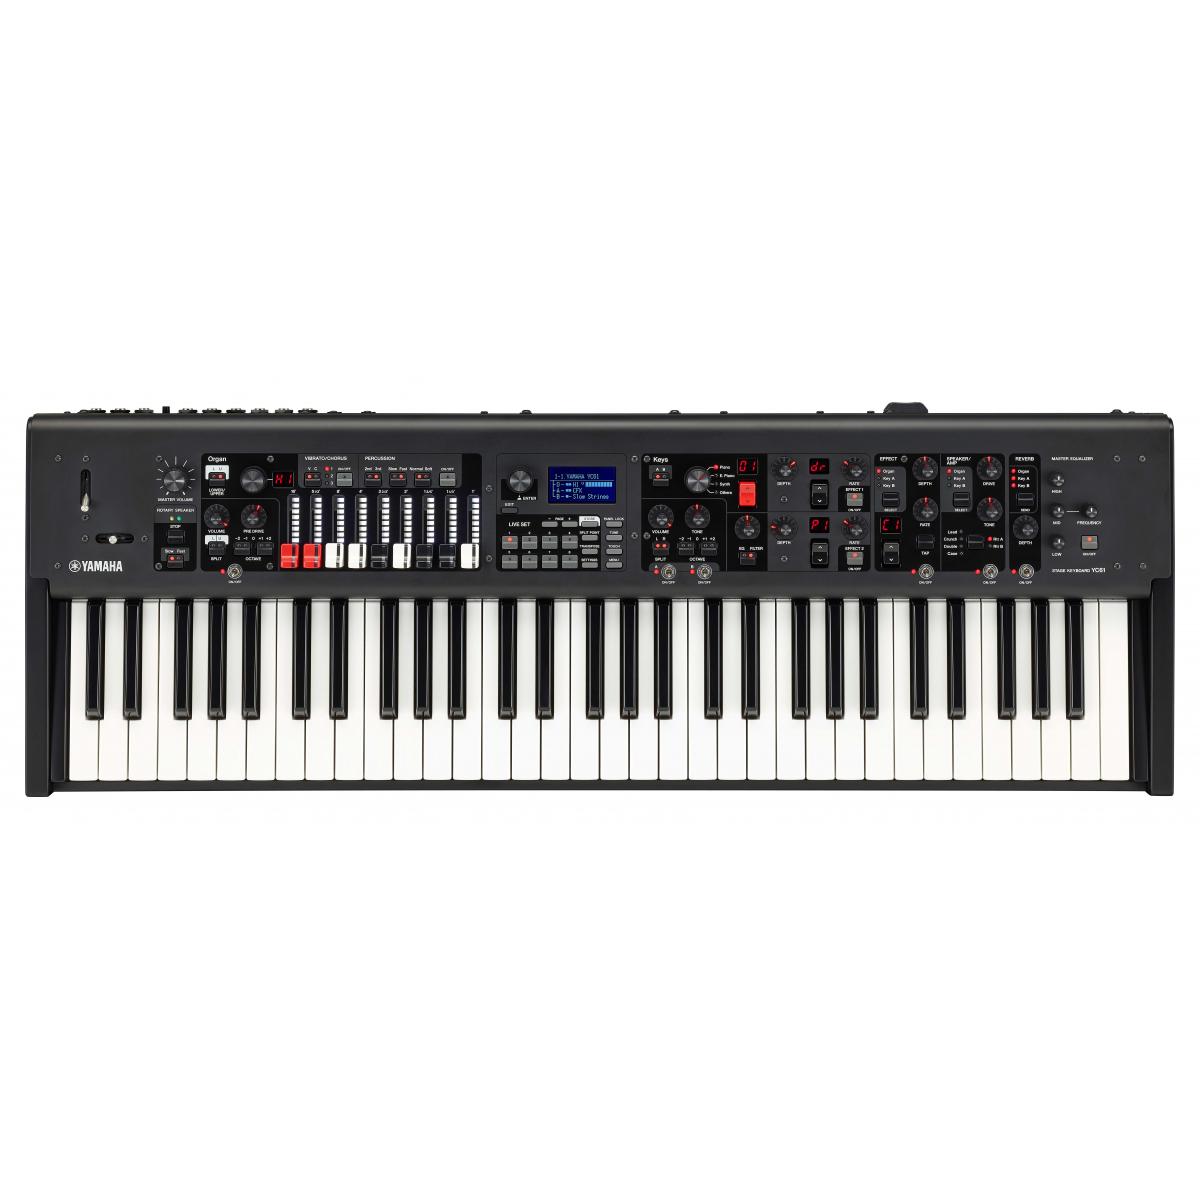 Claviers de scène - Yamaha - YC61